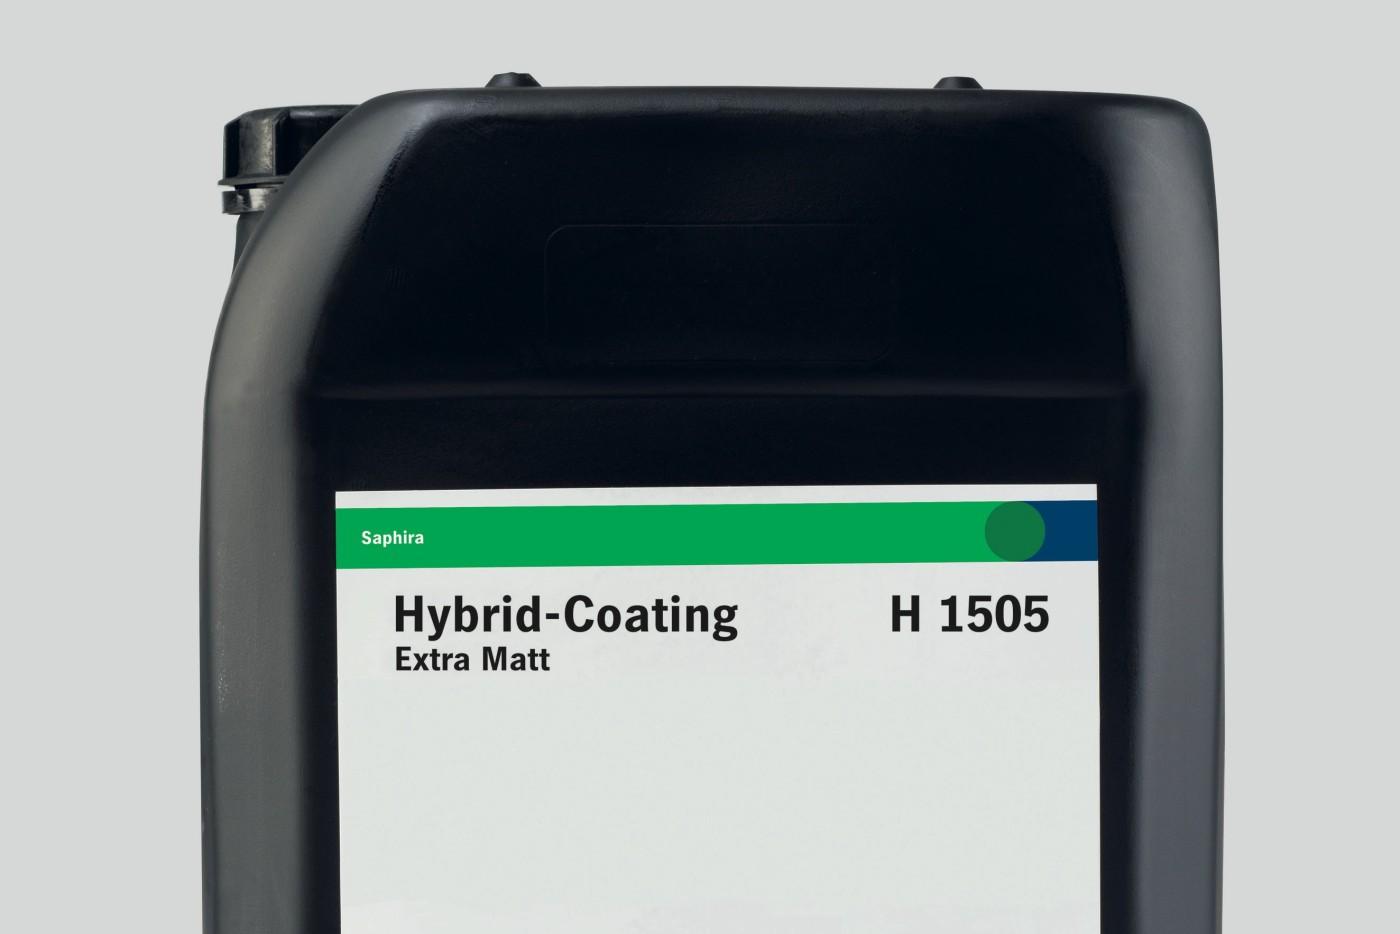 20180518_2_Saphira_Hybrid_Coating_H1505